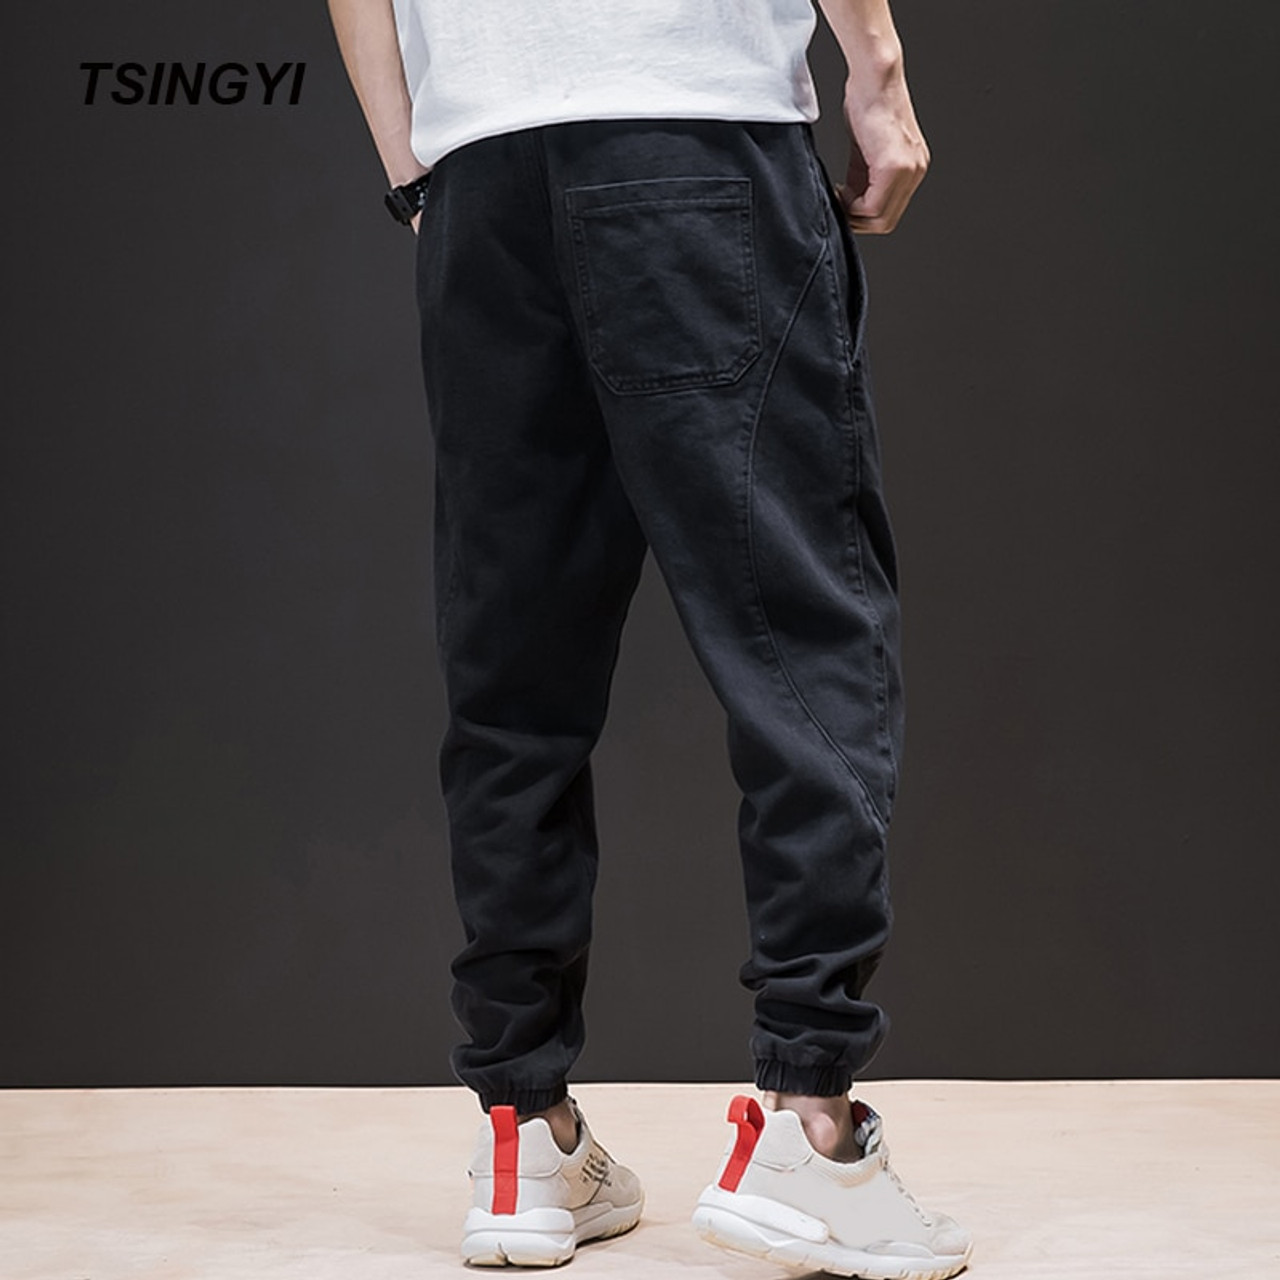 be1c12de3fa ... Tsingyi Spring Summer Japan Style Do old Wash Denim Jeans Blue Black  Mens joggers Hip Hop ...